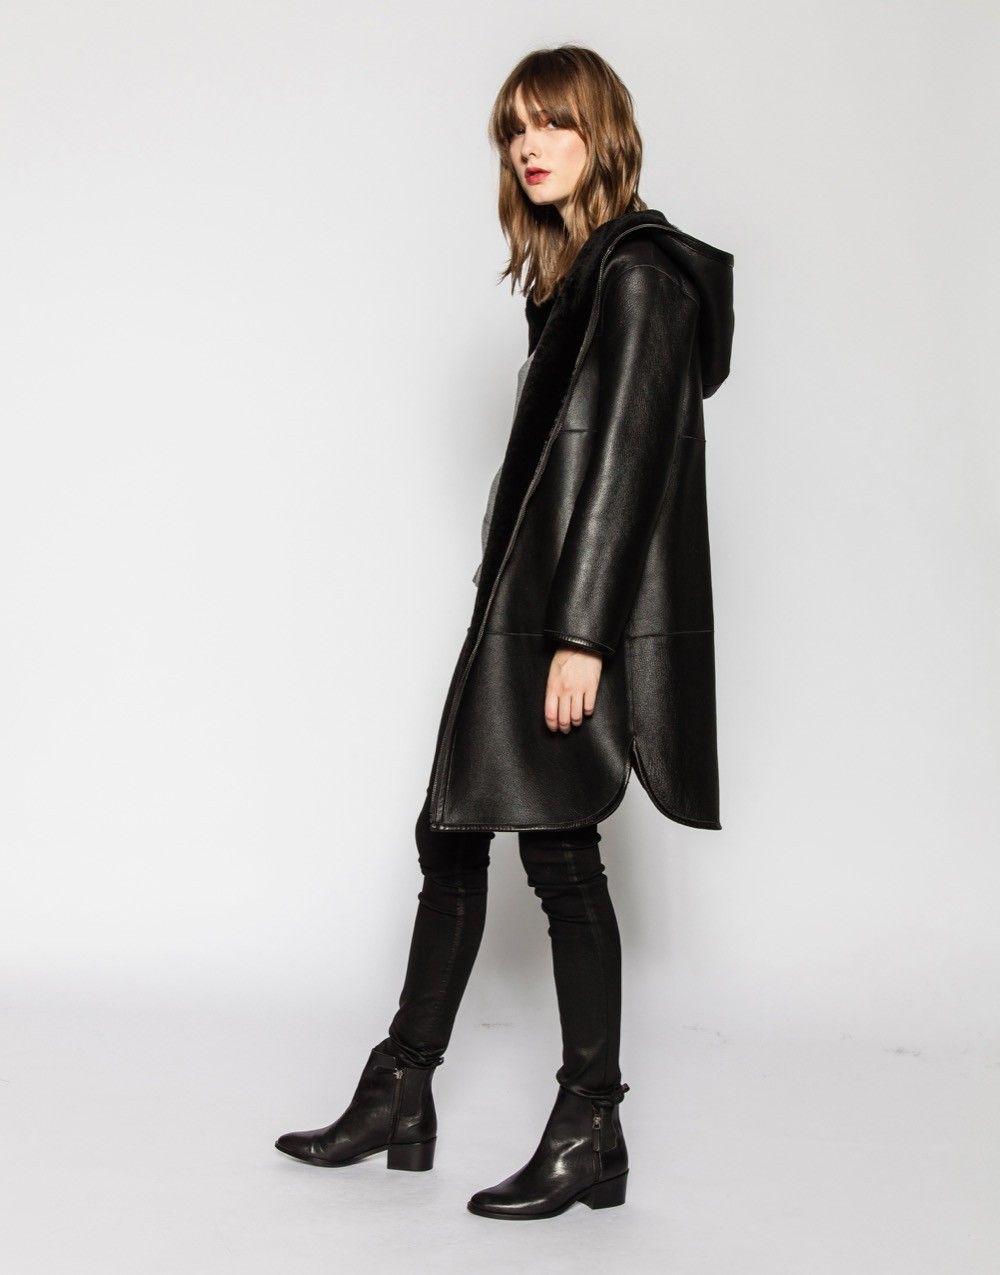 Zapa veste en cuir femme